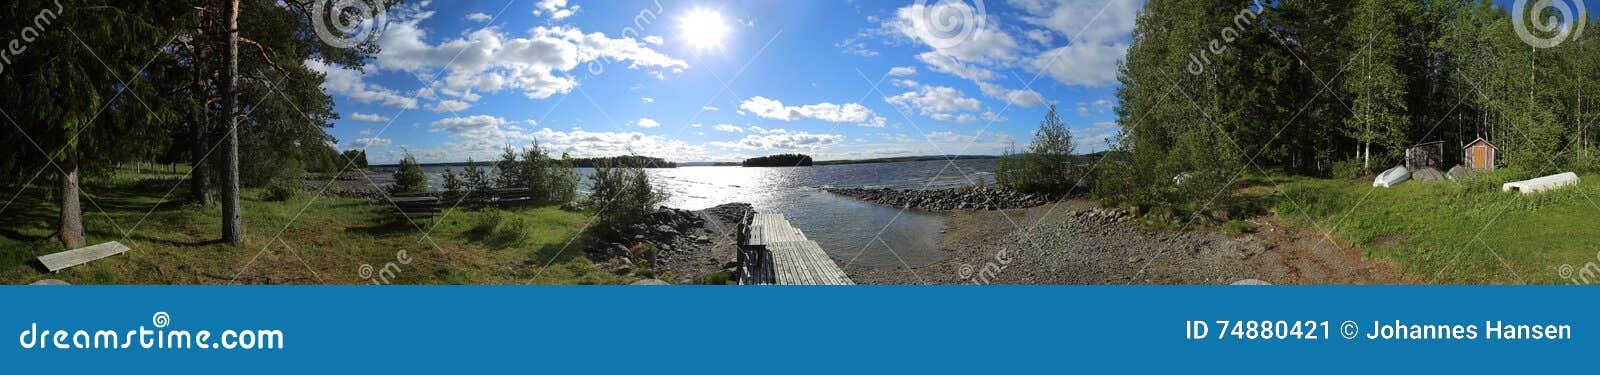 Aterrando e banhando o panorama do lugar na ilha Oehn no lago sueco Stroems Vattudal